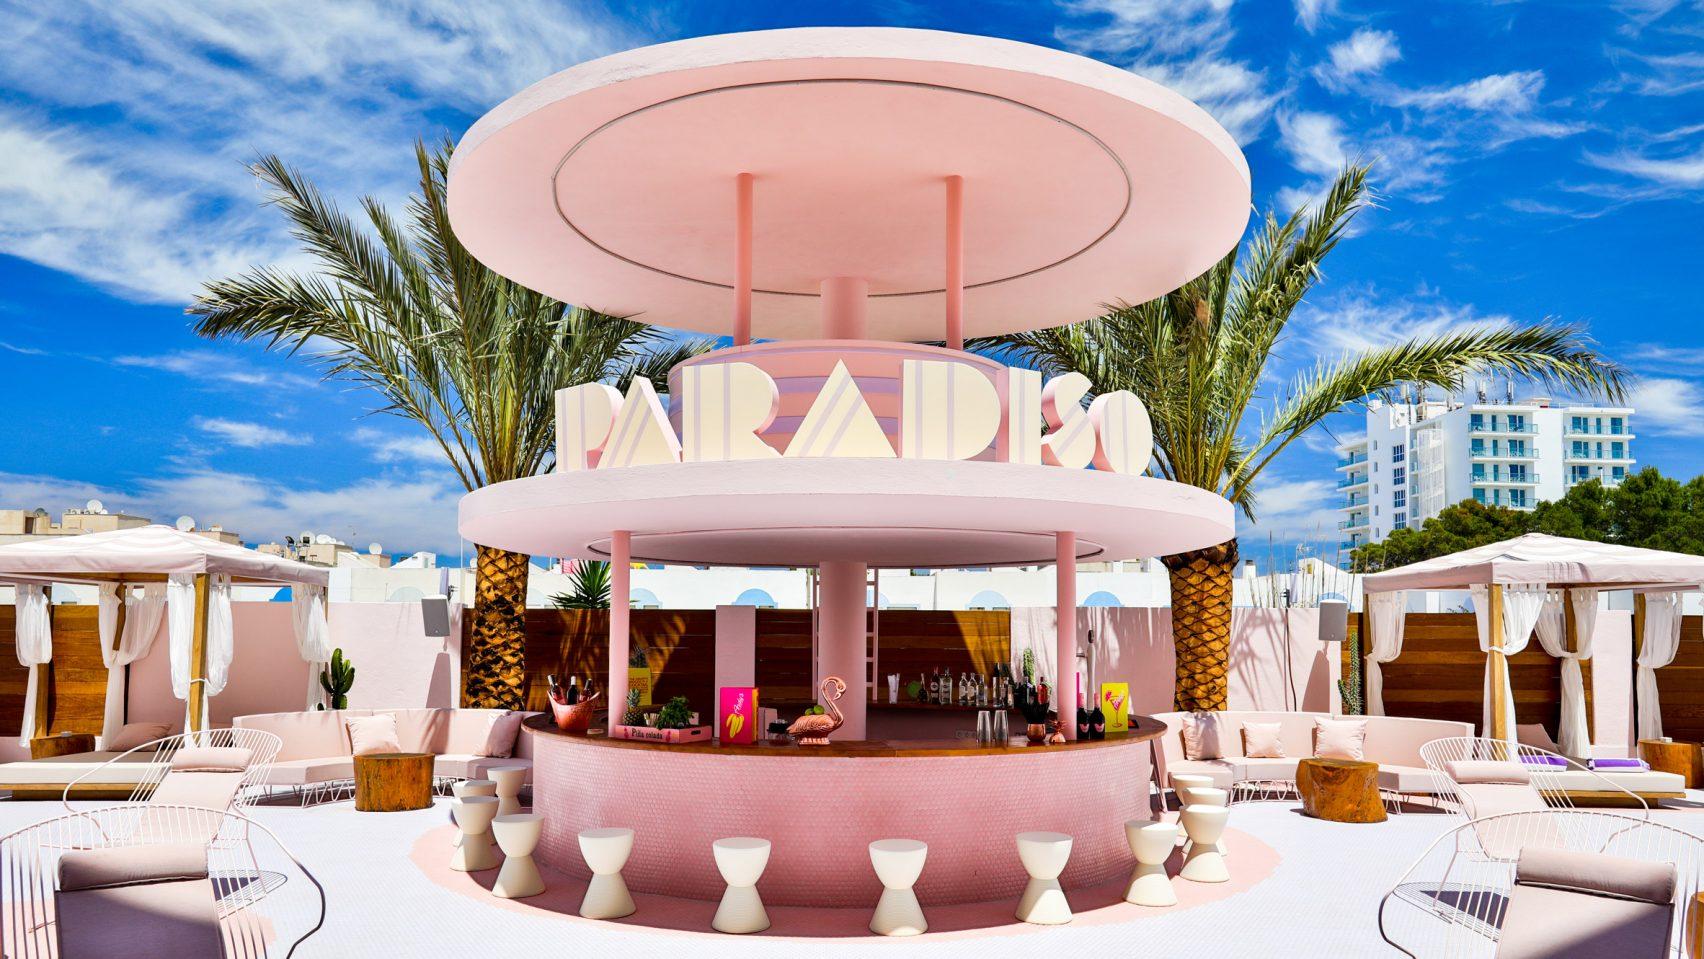 Конфетный Paradiso Ibiza Art Hotel